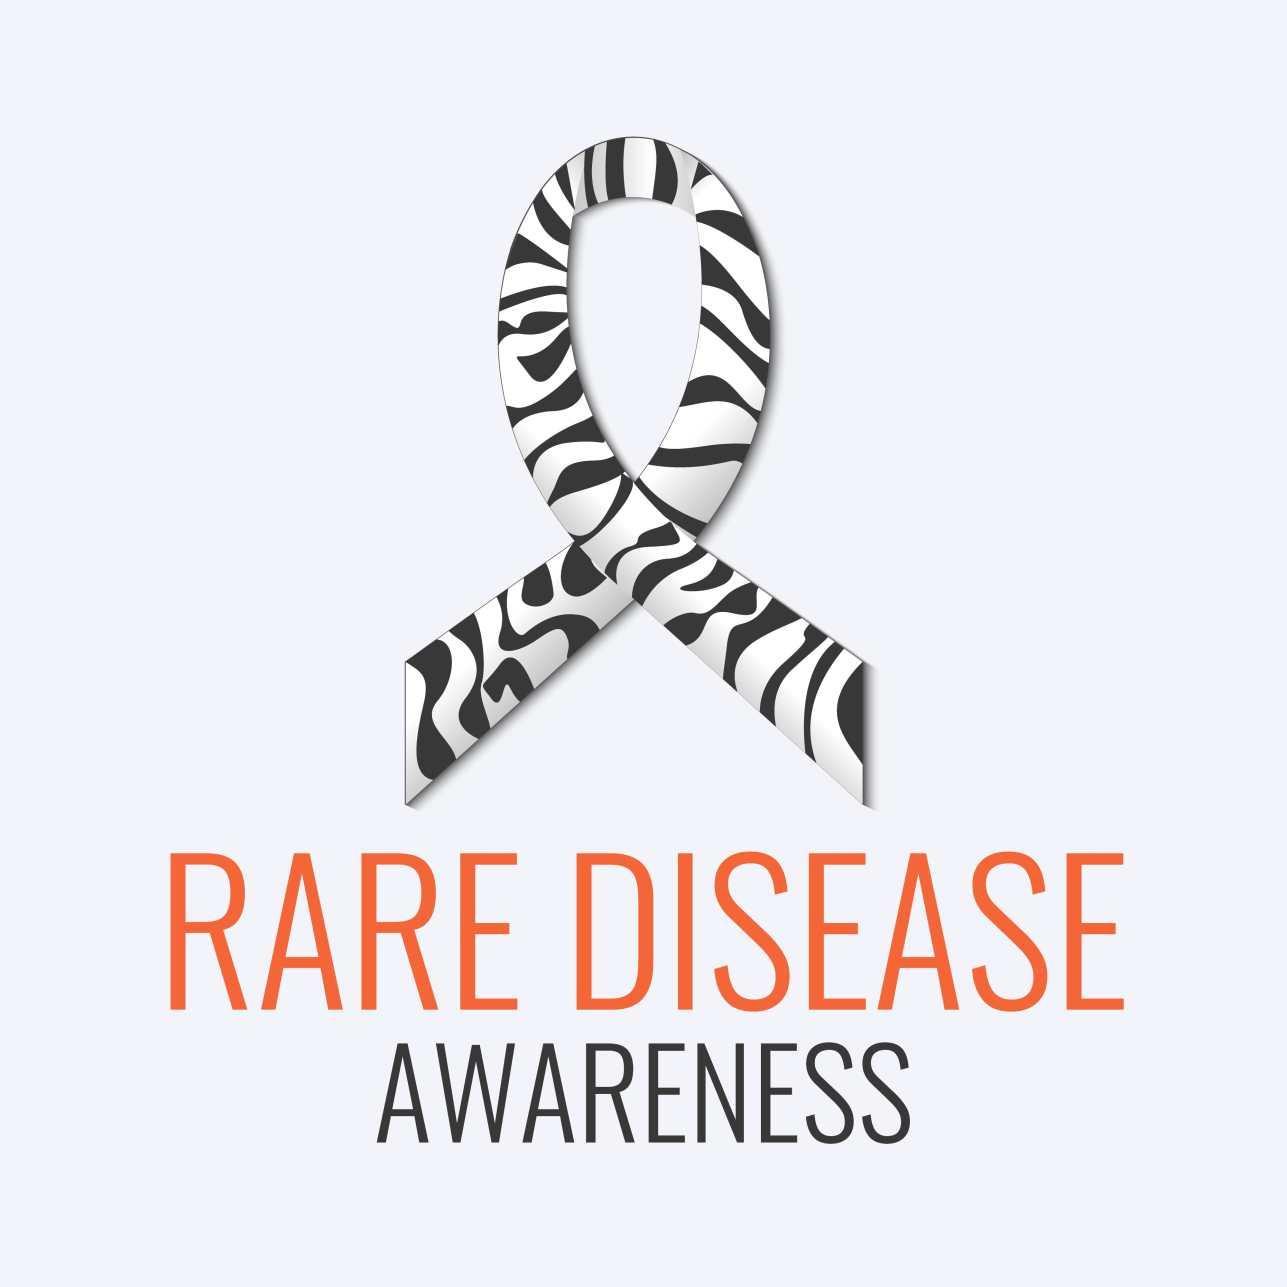 rare disease Image ID: 59305013